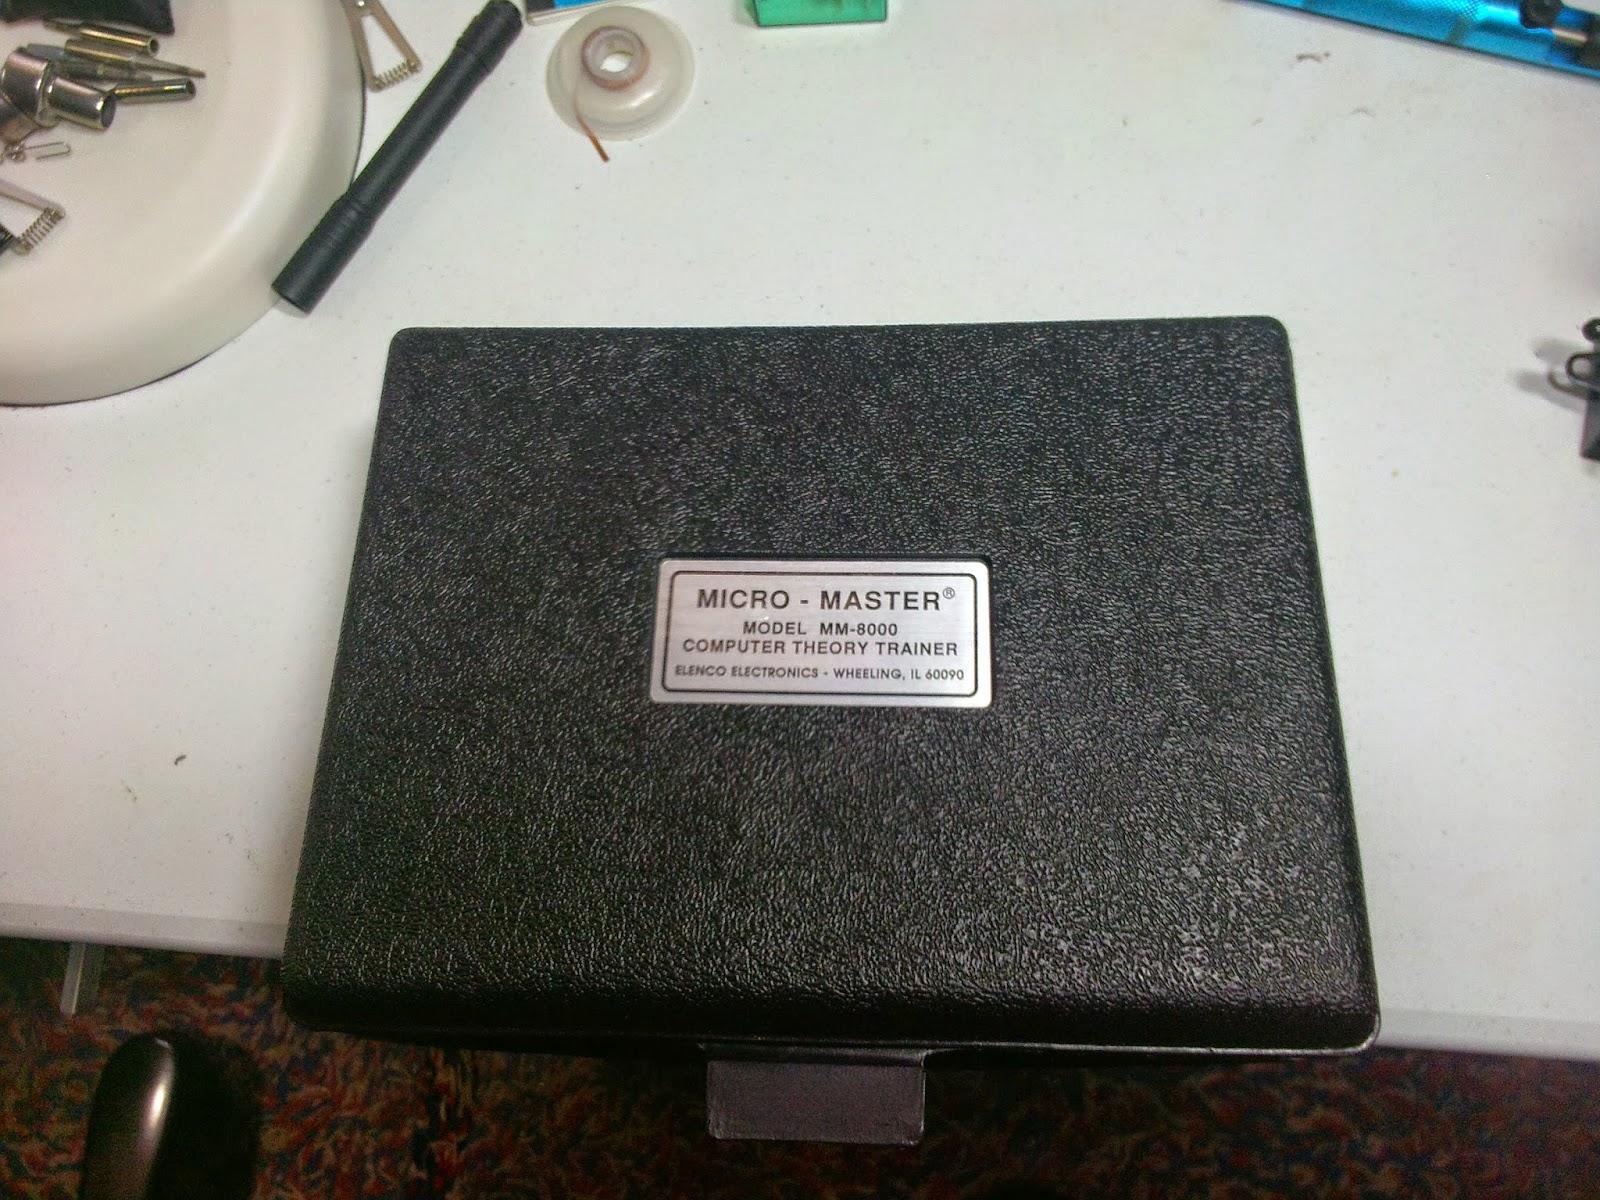 Elenco MM-8000 Micro-Master Computer Theory Trainer